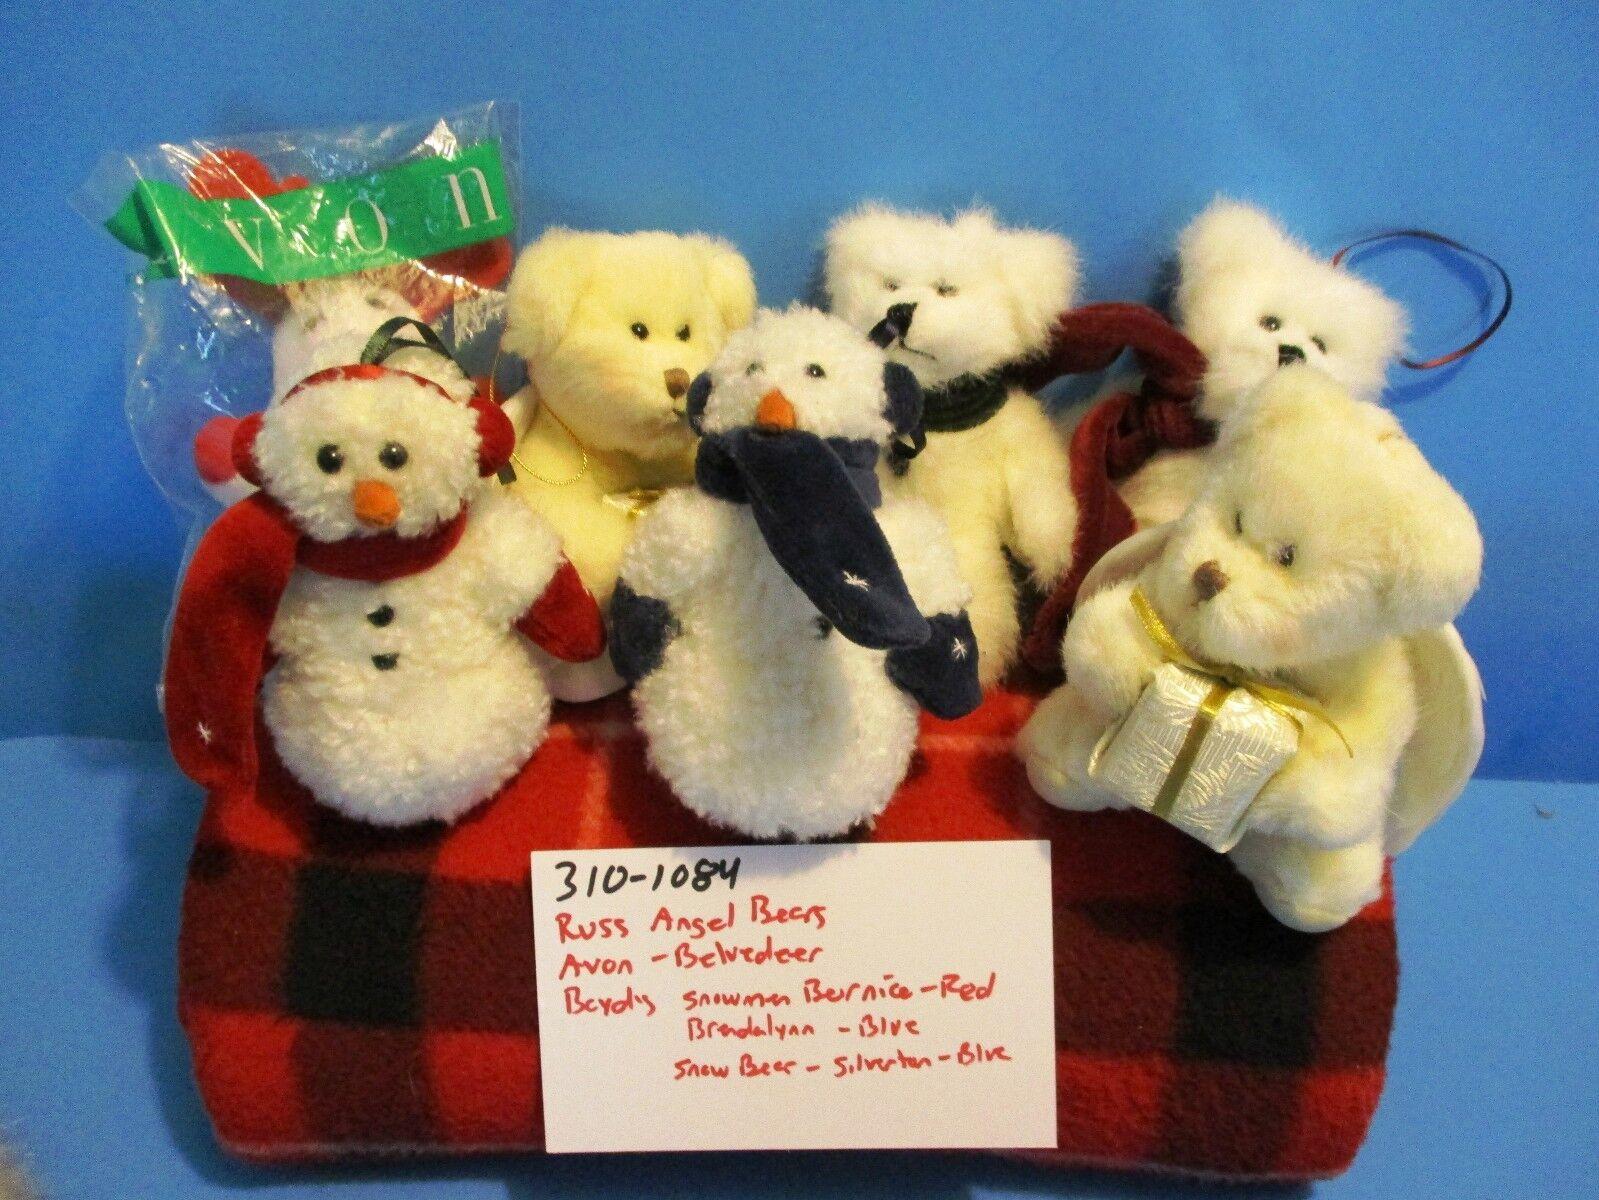 Boyd's ,Avon, Russ Christmas Ornament Bears plush lot of 8  310-1084